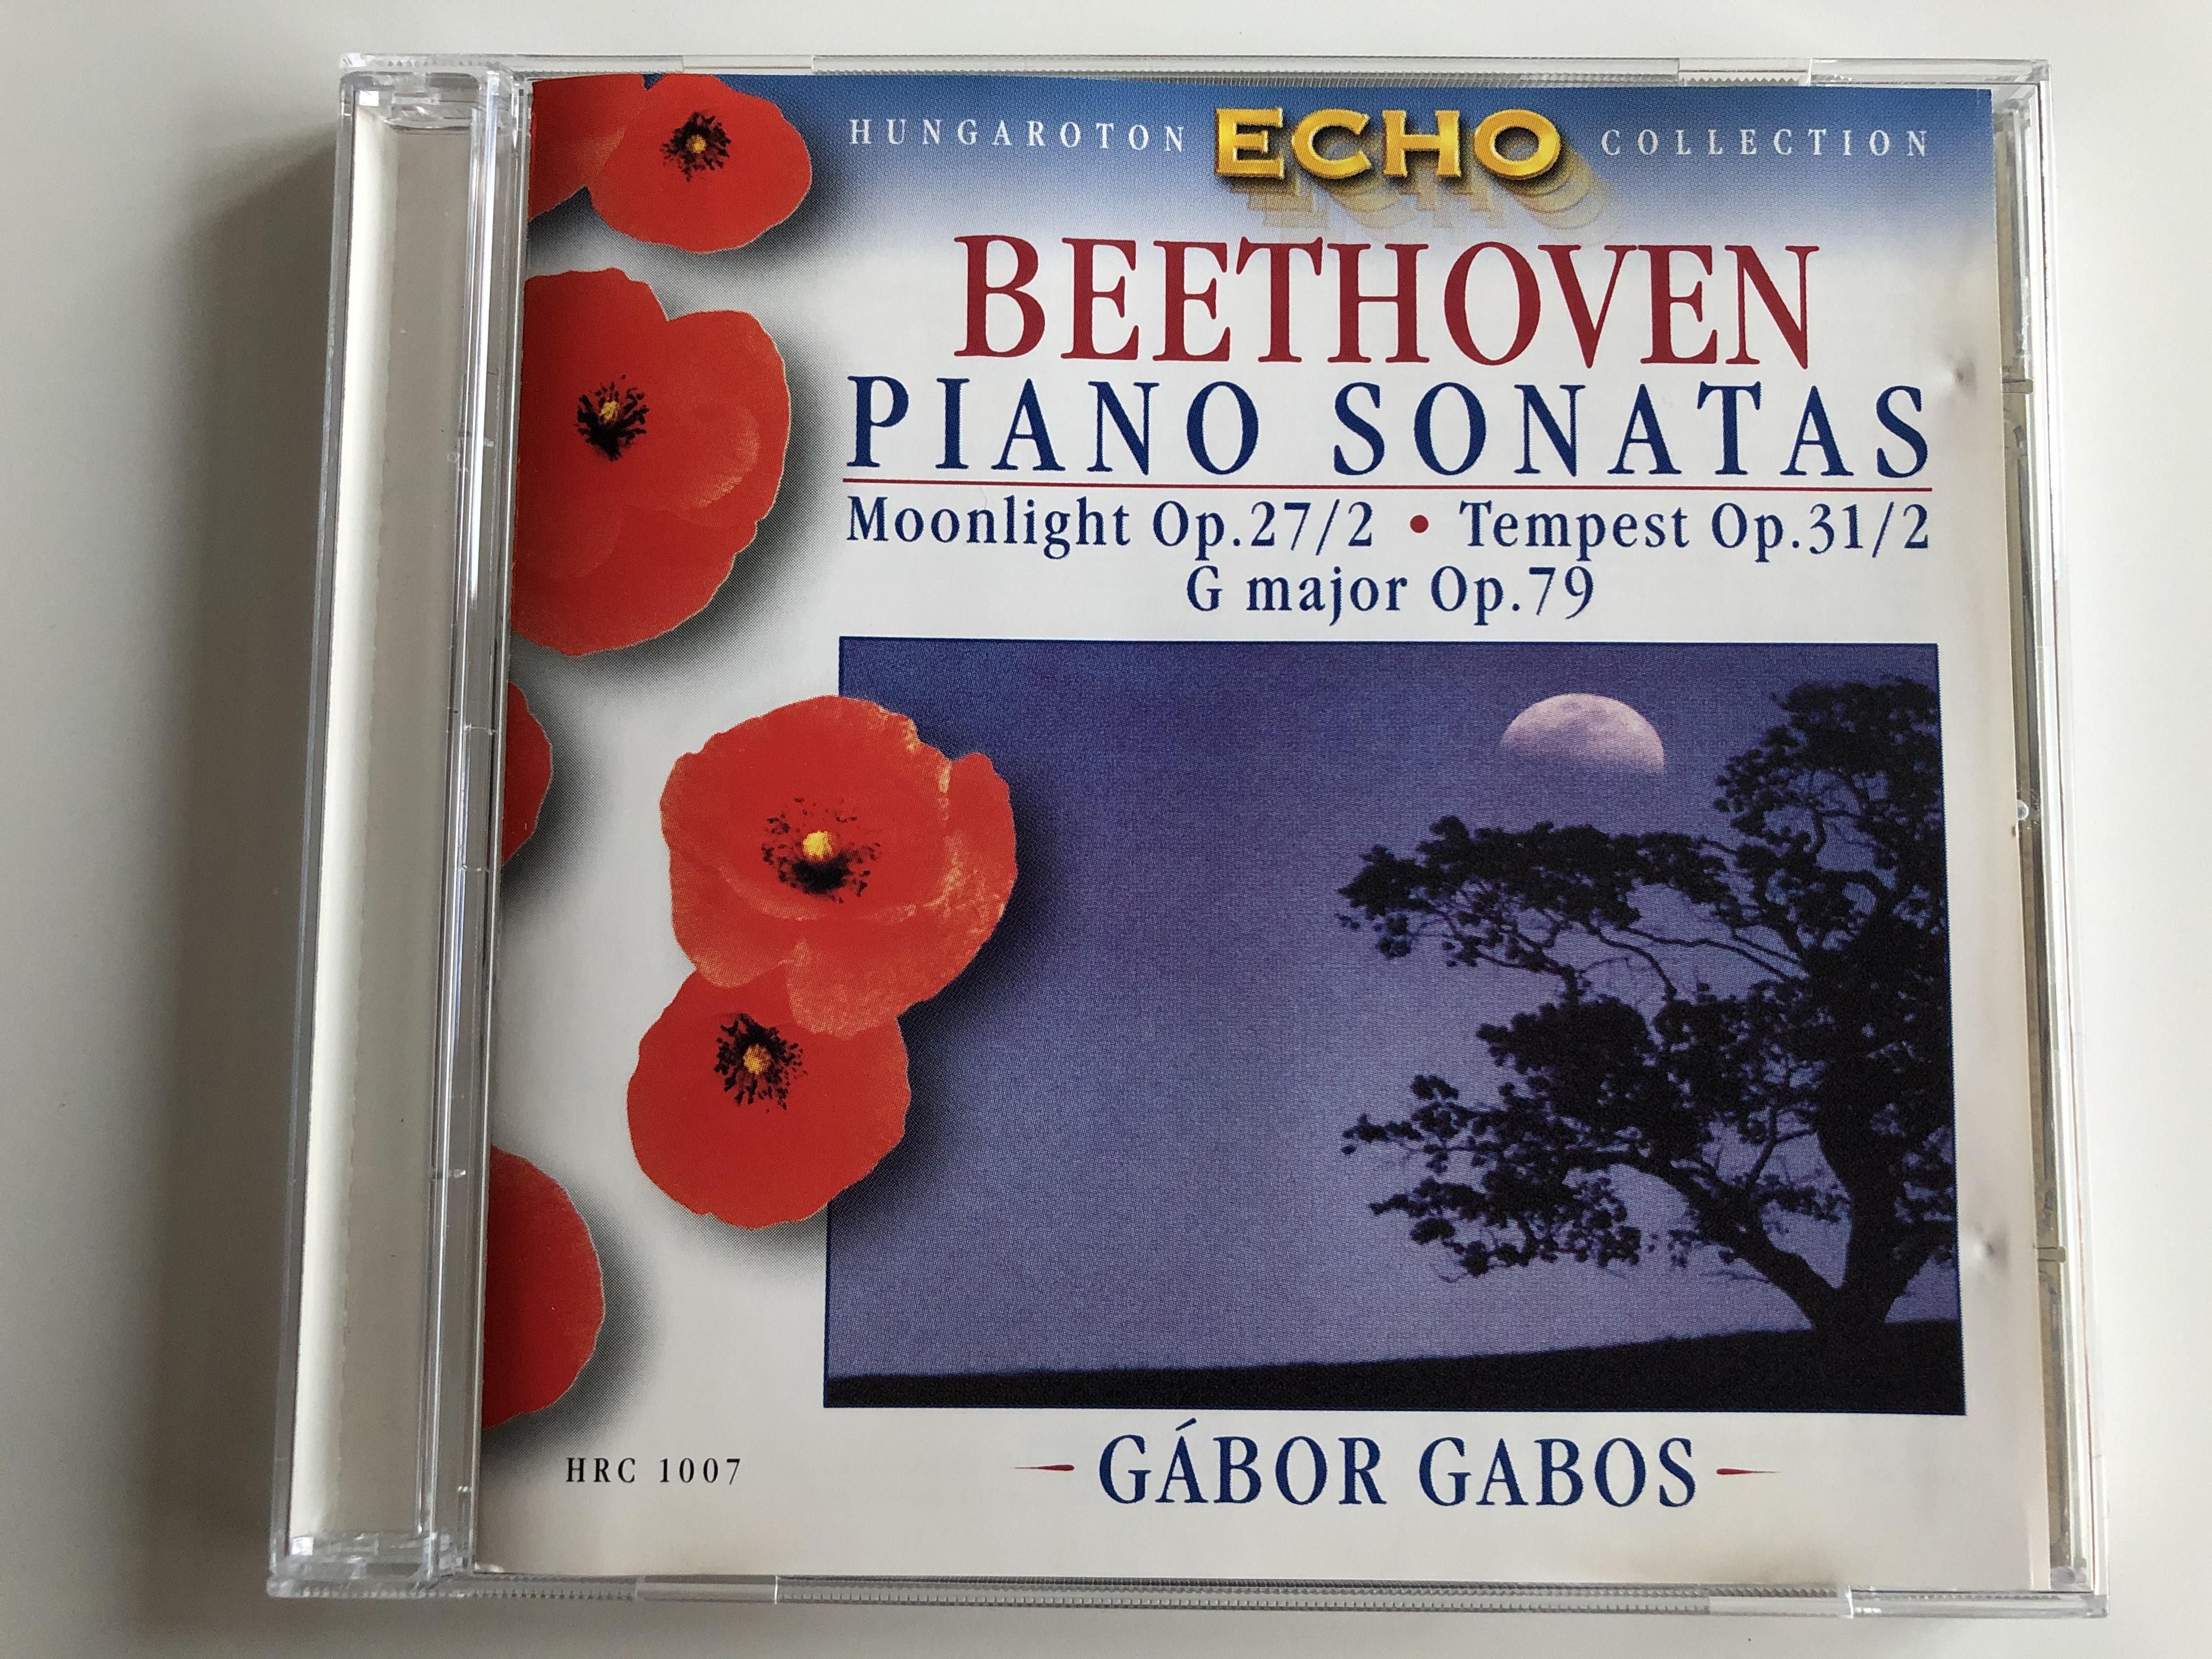 beethoven-piano-sonatas-moonlight-op.-272-tempest-op.-312-g-major-op.79-g-bor-gabos-hungaroton-classic-audio-cd-1962-stereo-hrc-1007-1-.jpg